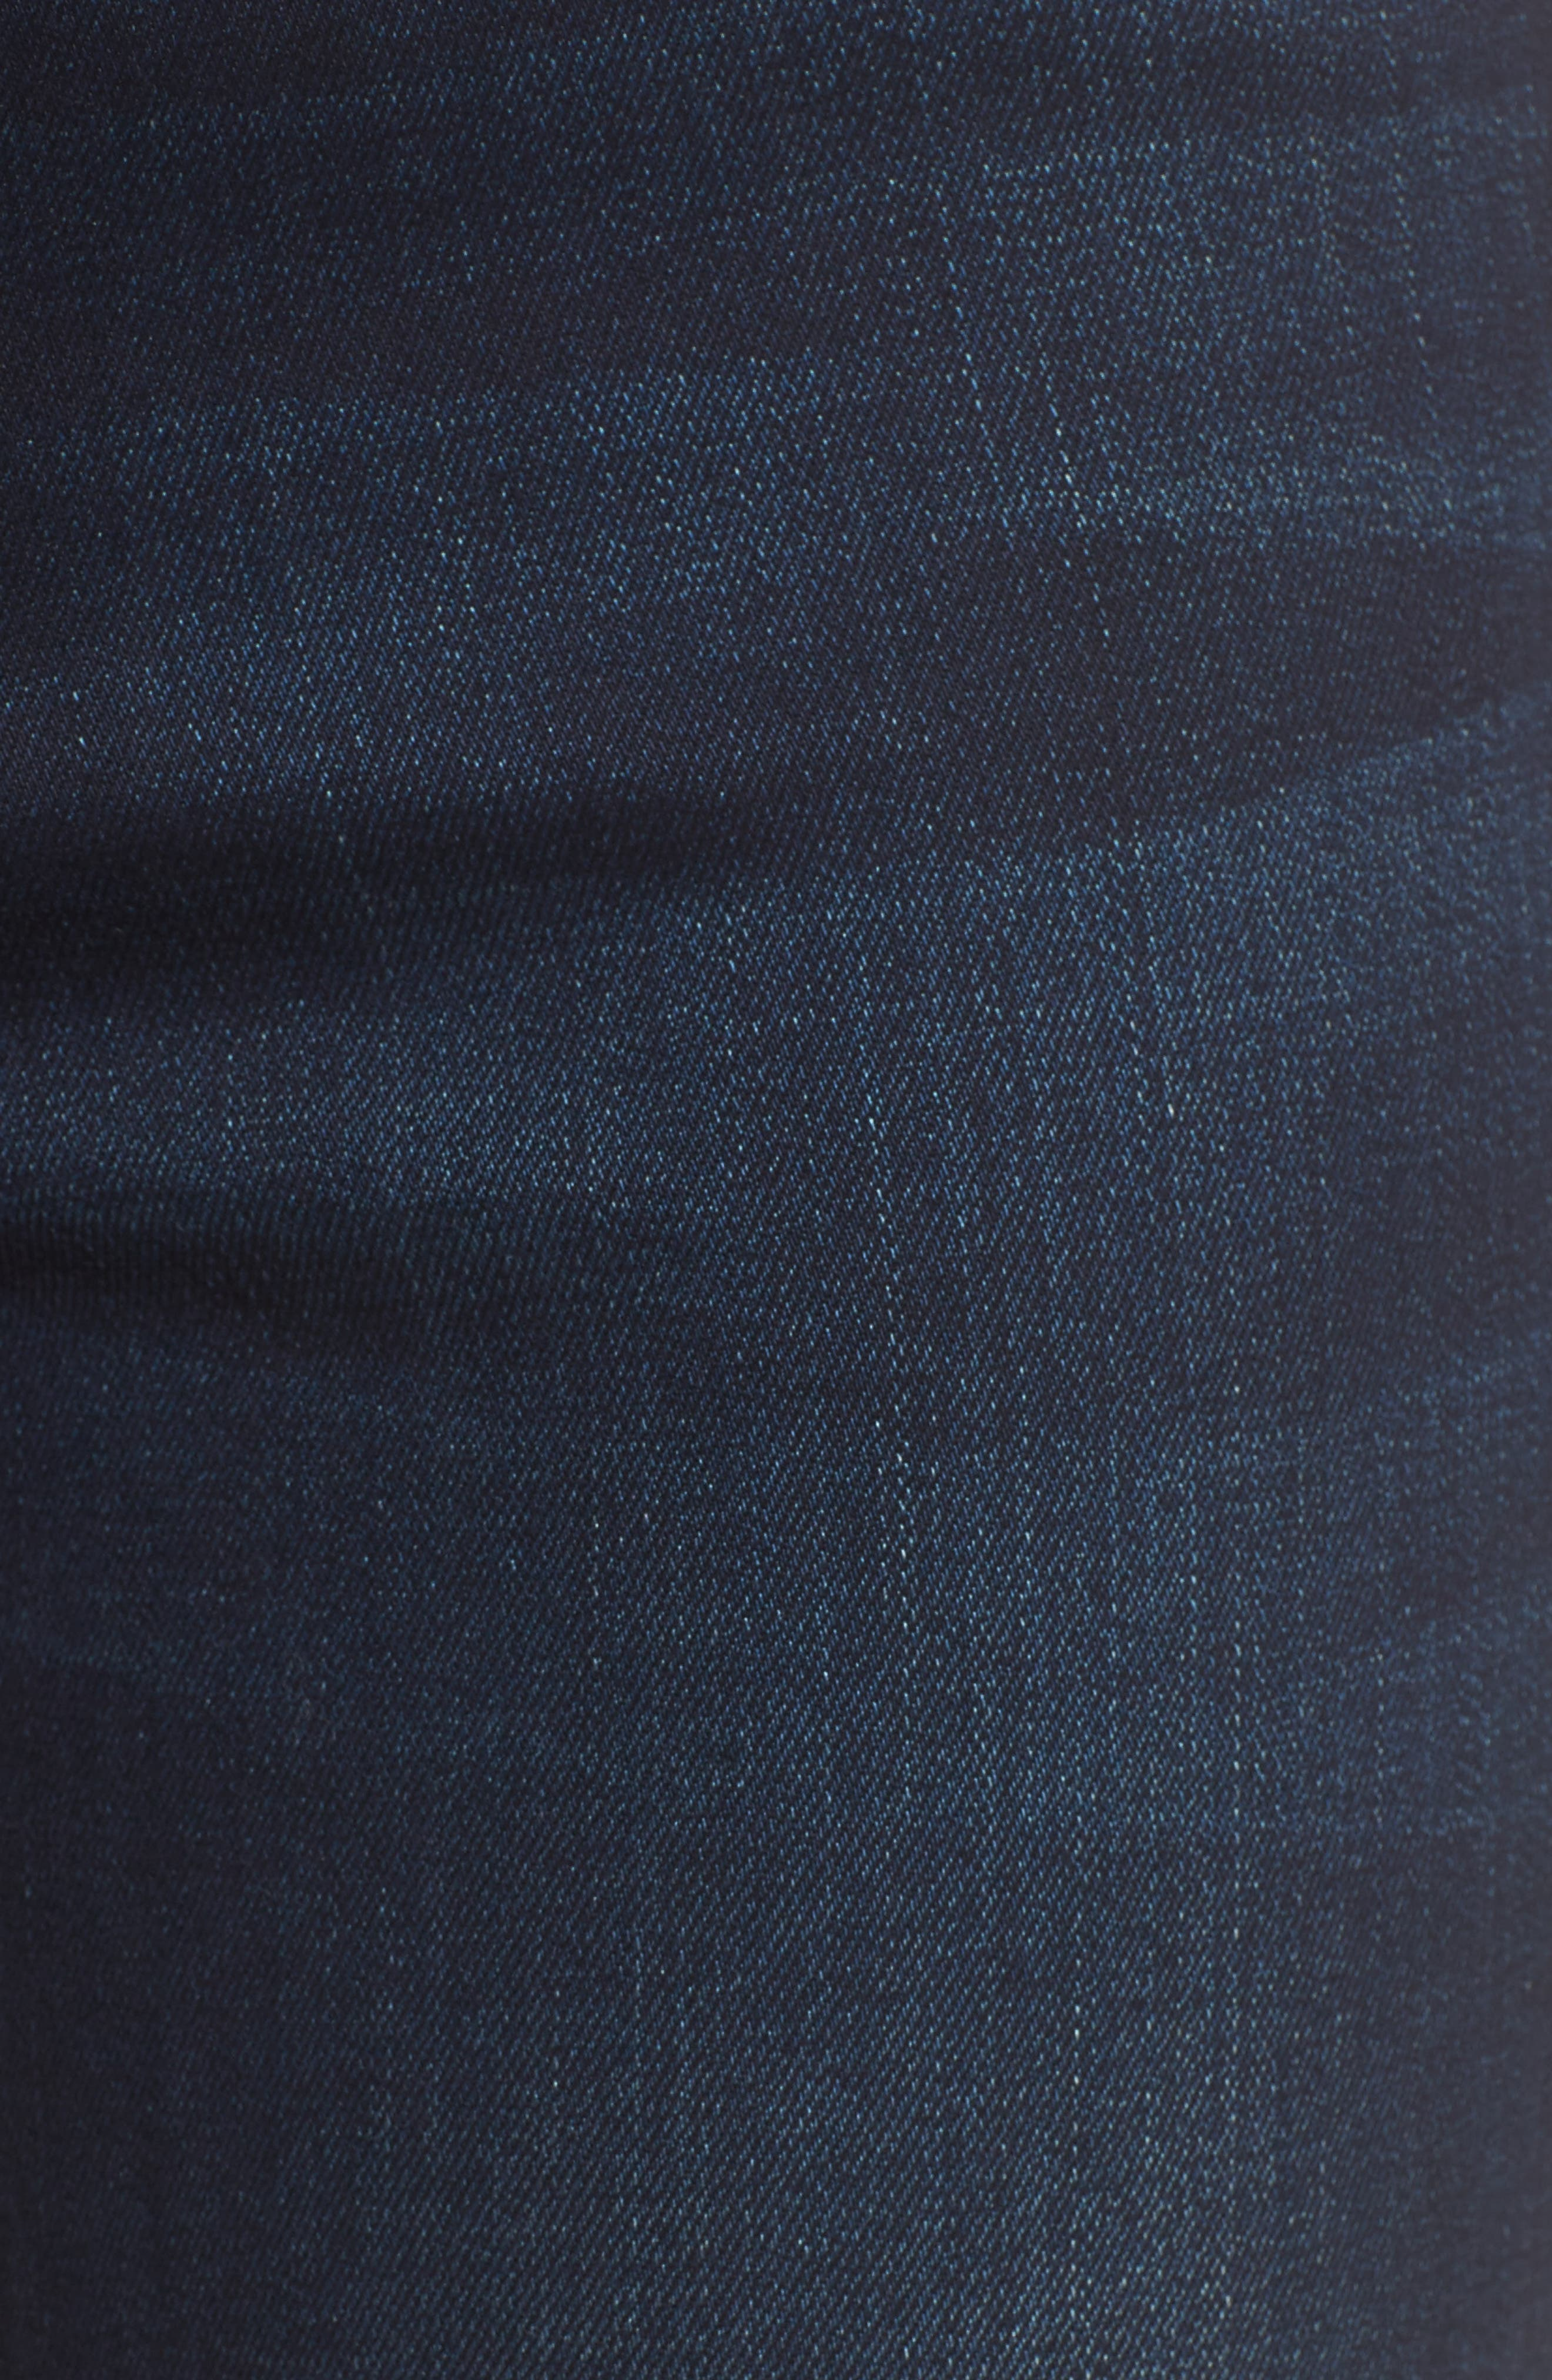 Fidelity Jeans Belvedere Skinny Jeans,                             Alternate thumbnail 5, color,                             400